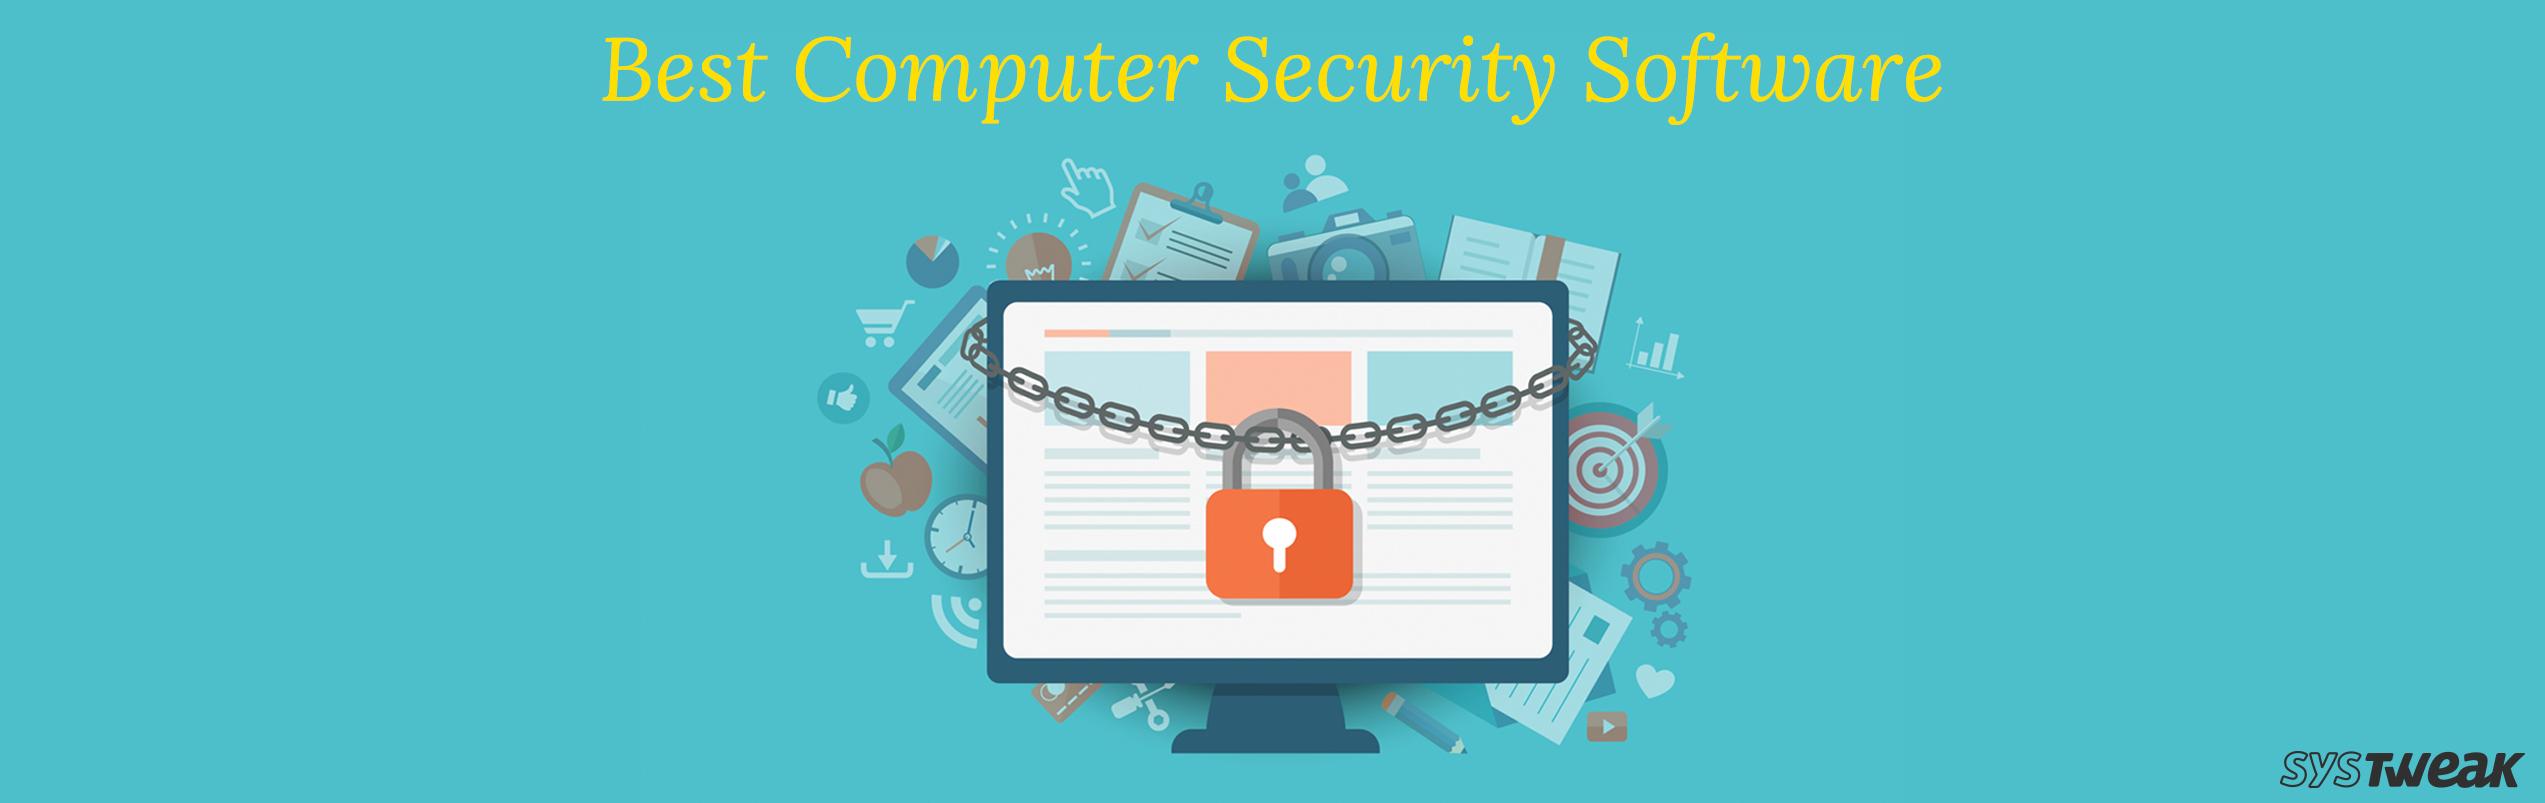 Best Security Windows 7